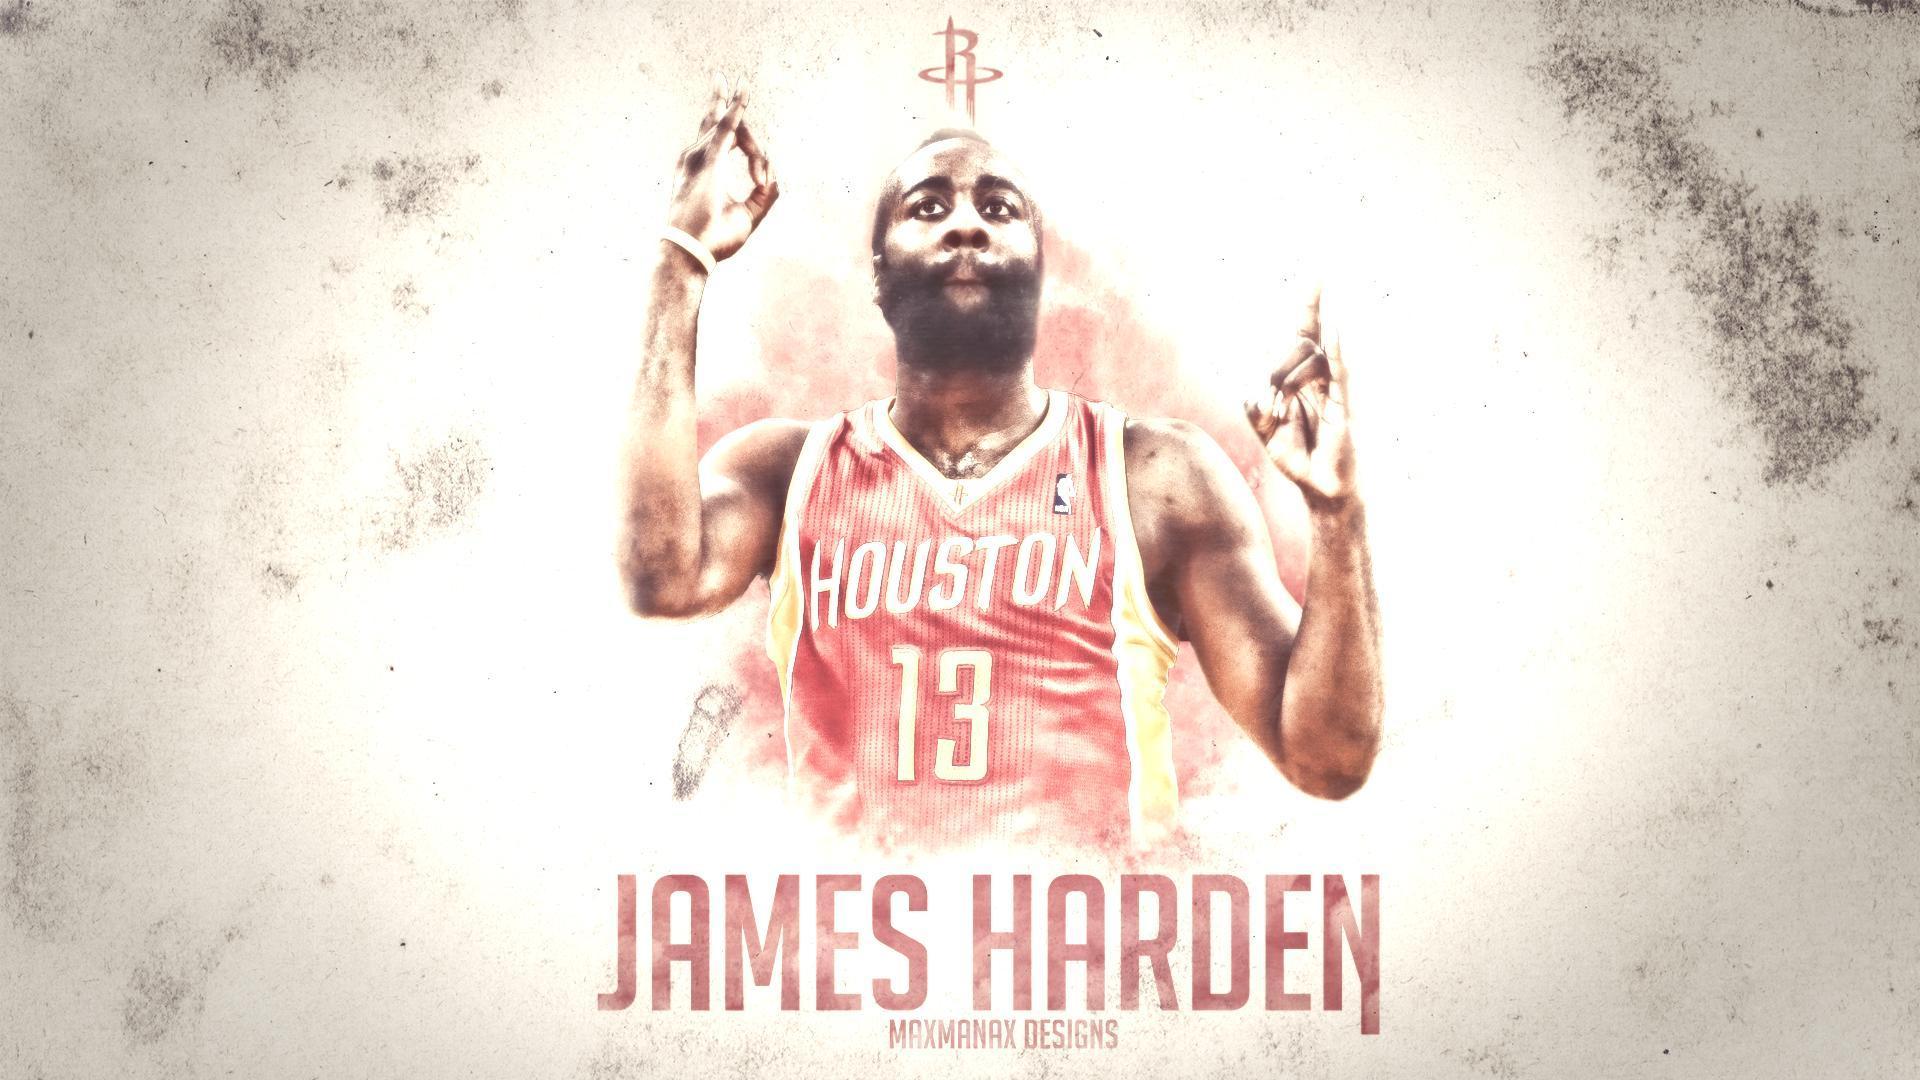 Basketball Player James Harden Wallpaper: Basketball Wallpapers 2015